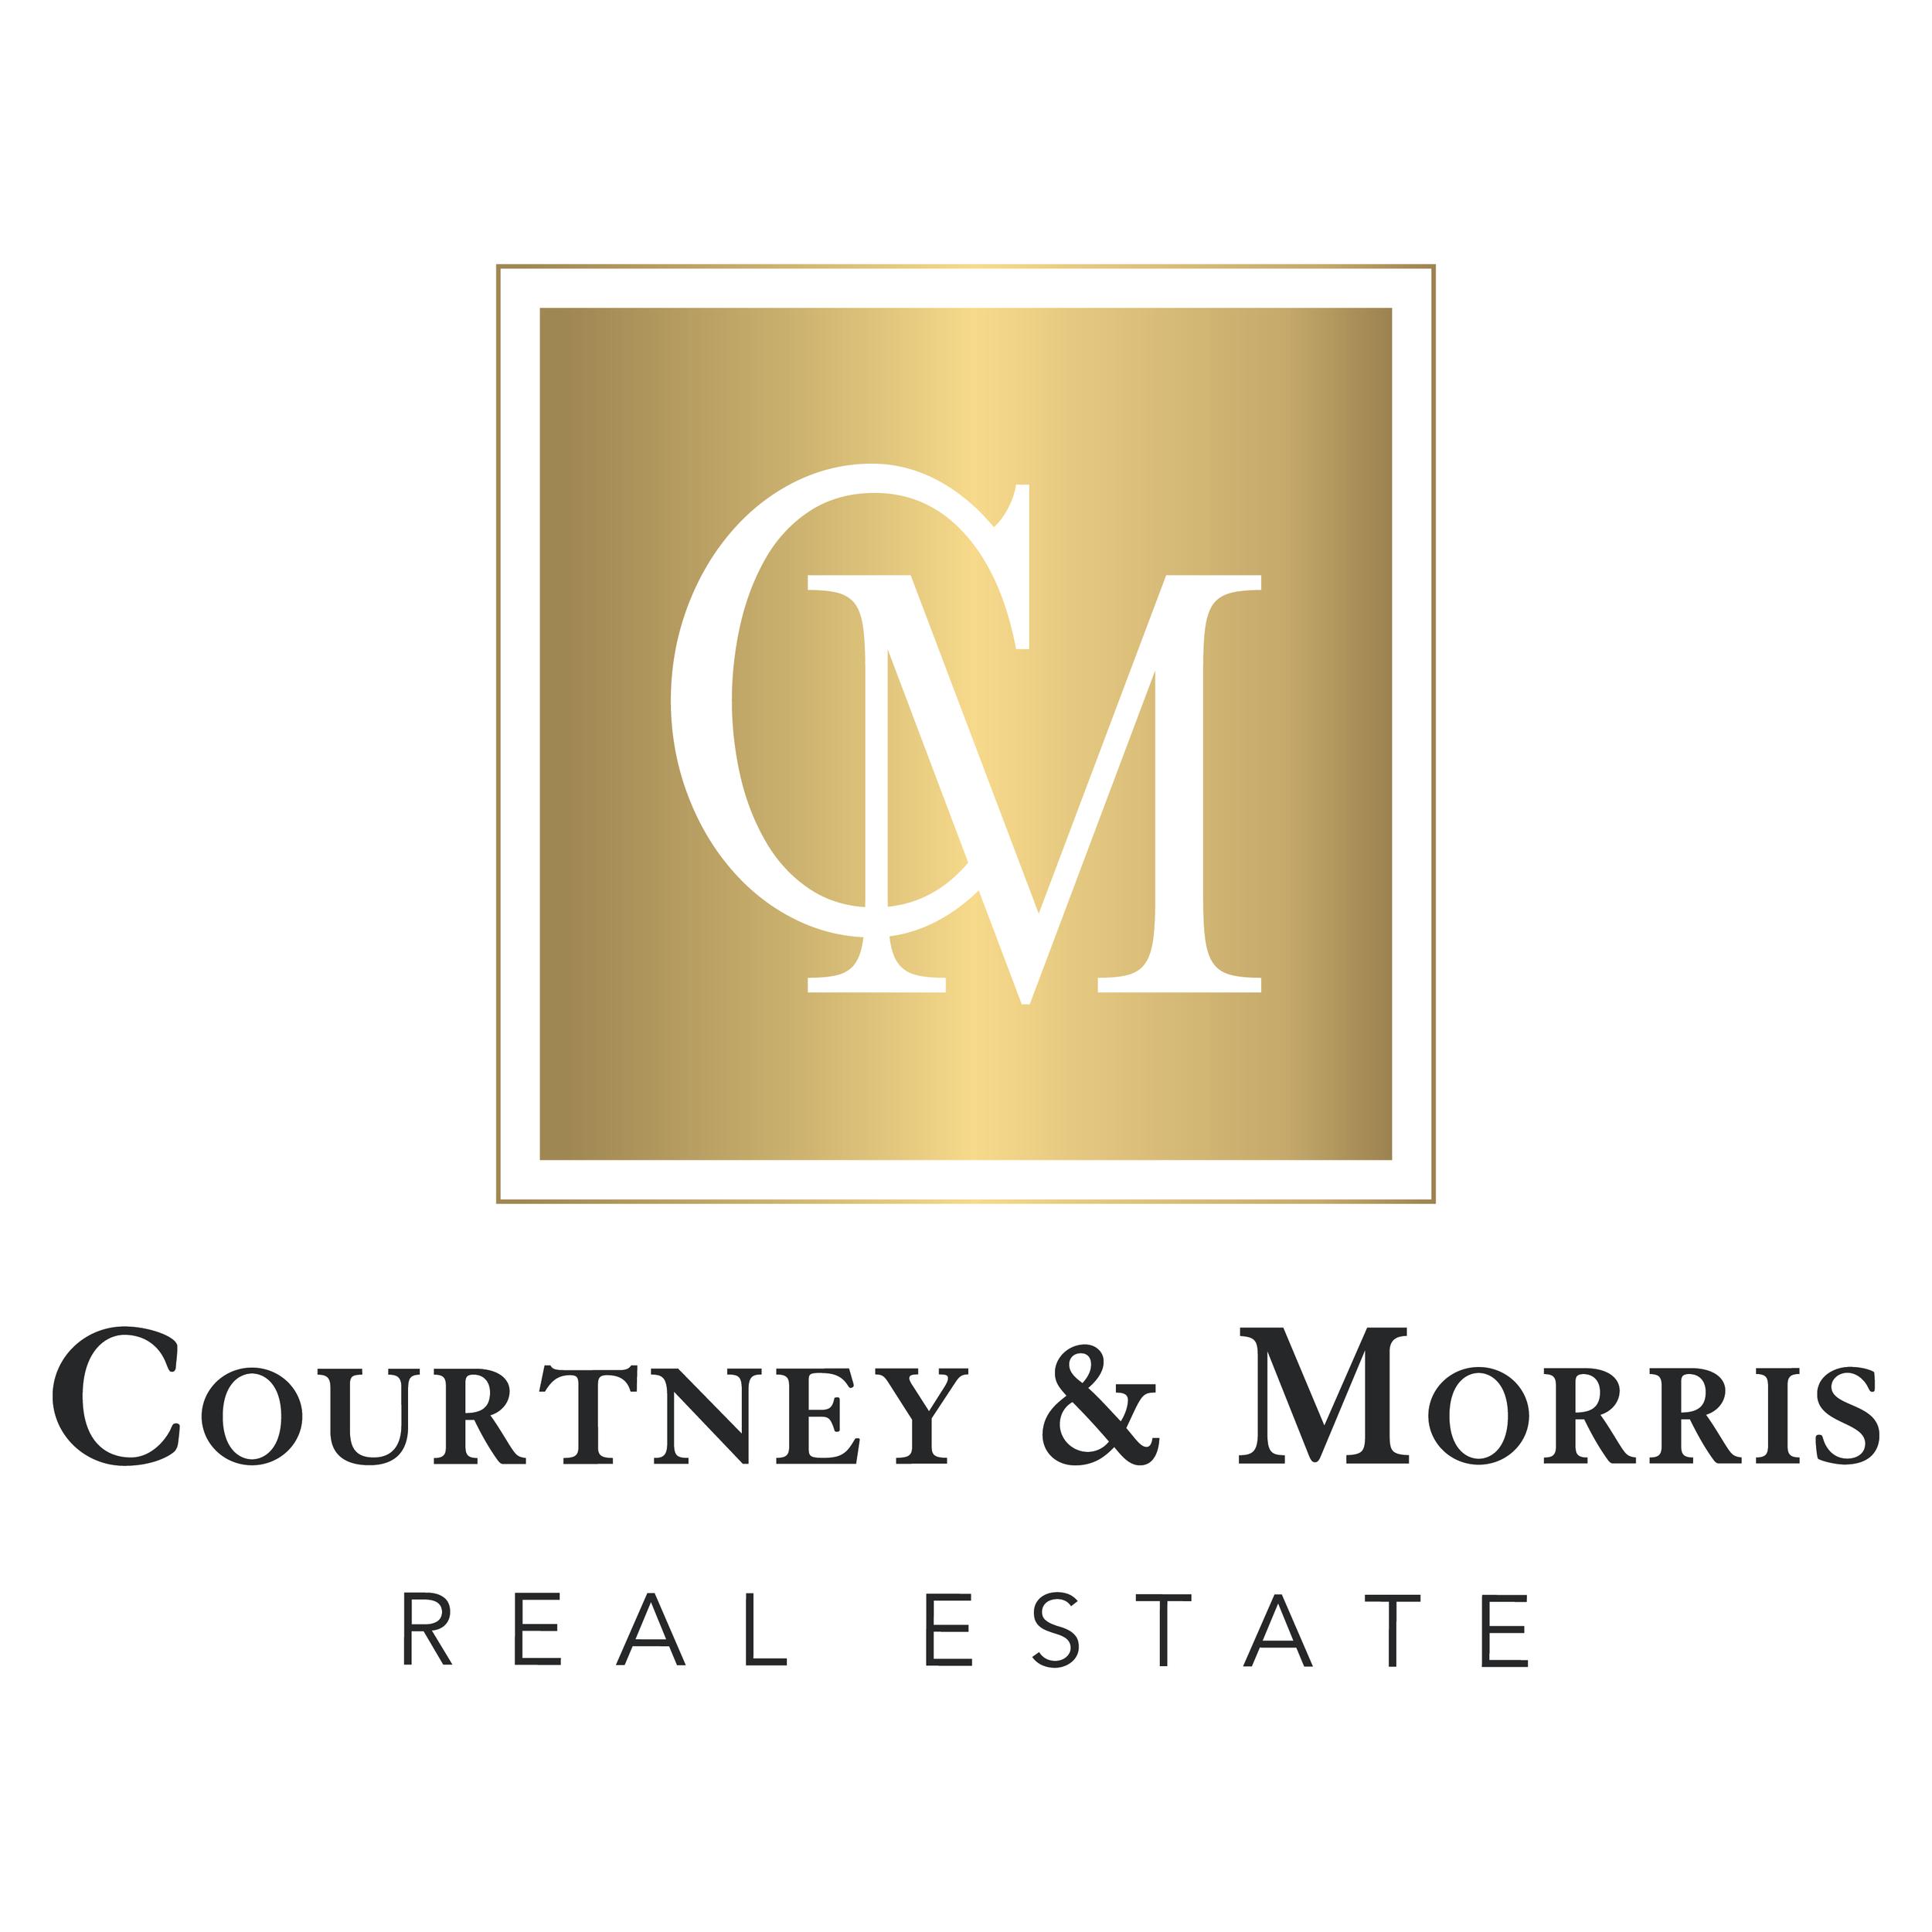 C  ourtney & Morris    branding + print